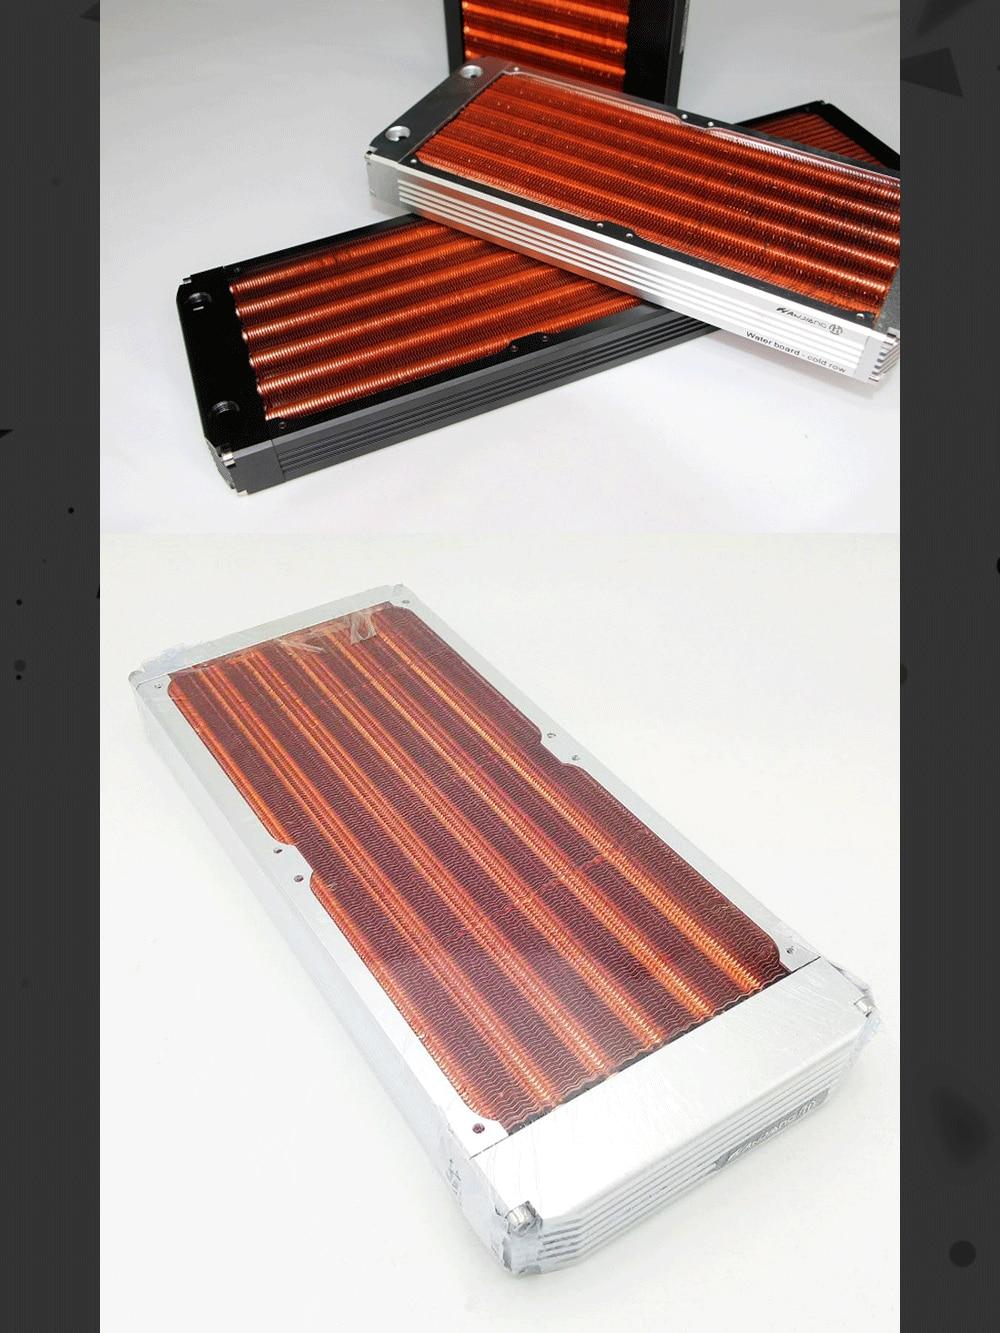 HanJiang HJ-SRQ, 120/240/360mm Copper Radiators, 30mm Thickness Water Cooling Radiators, For 120mm Fans